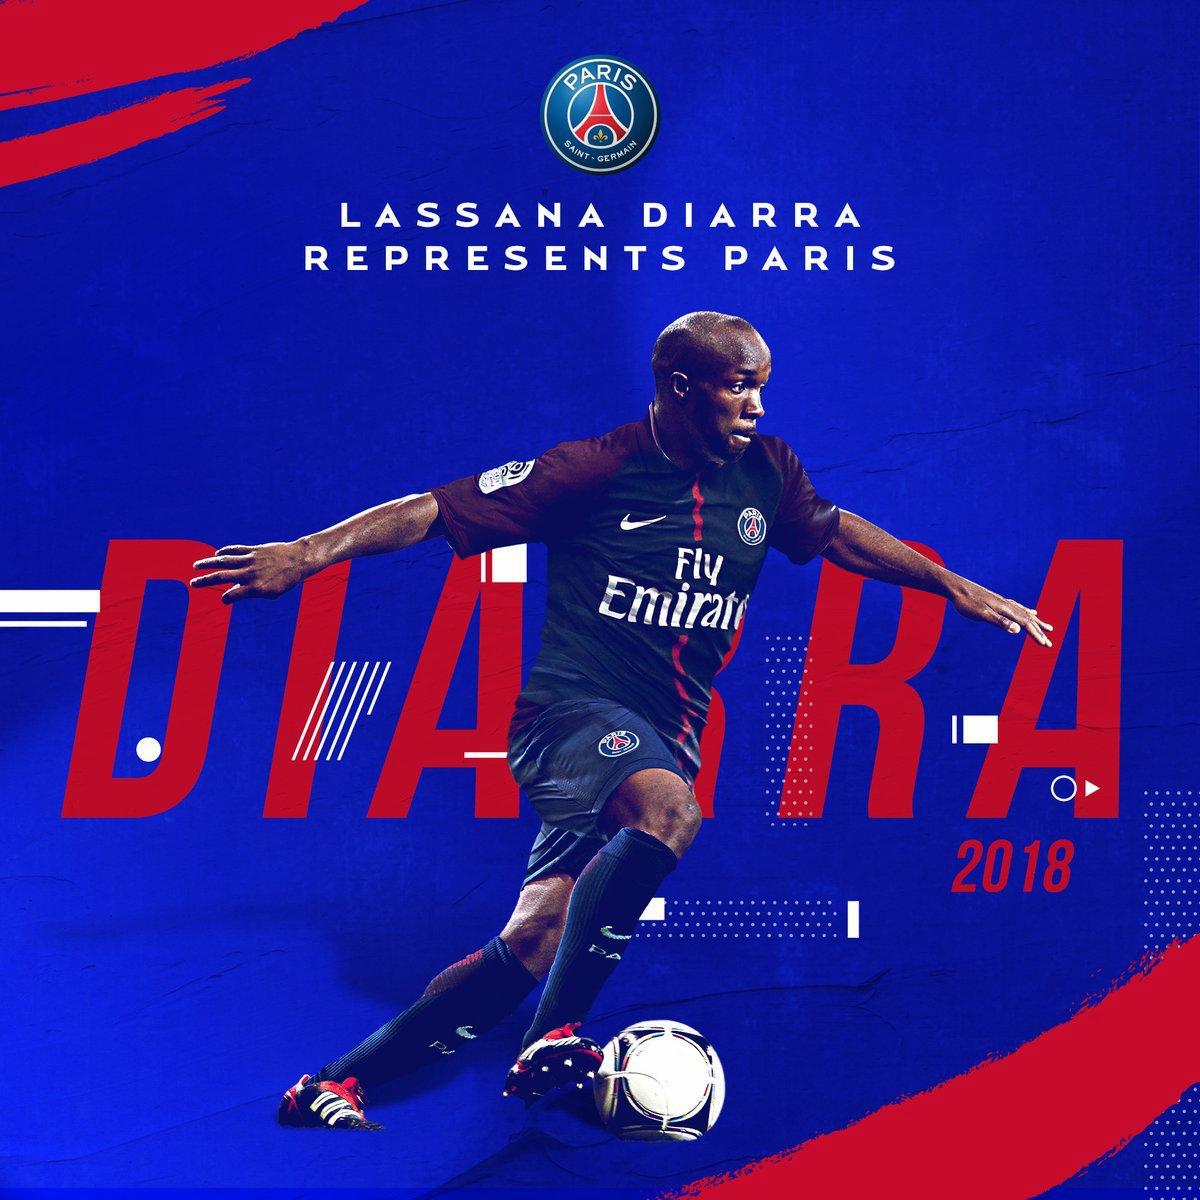 Maillot THIRD PSG Lassana DIARRA